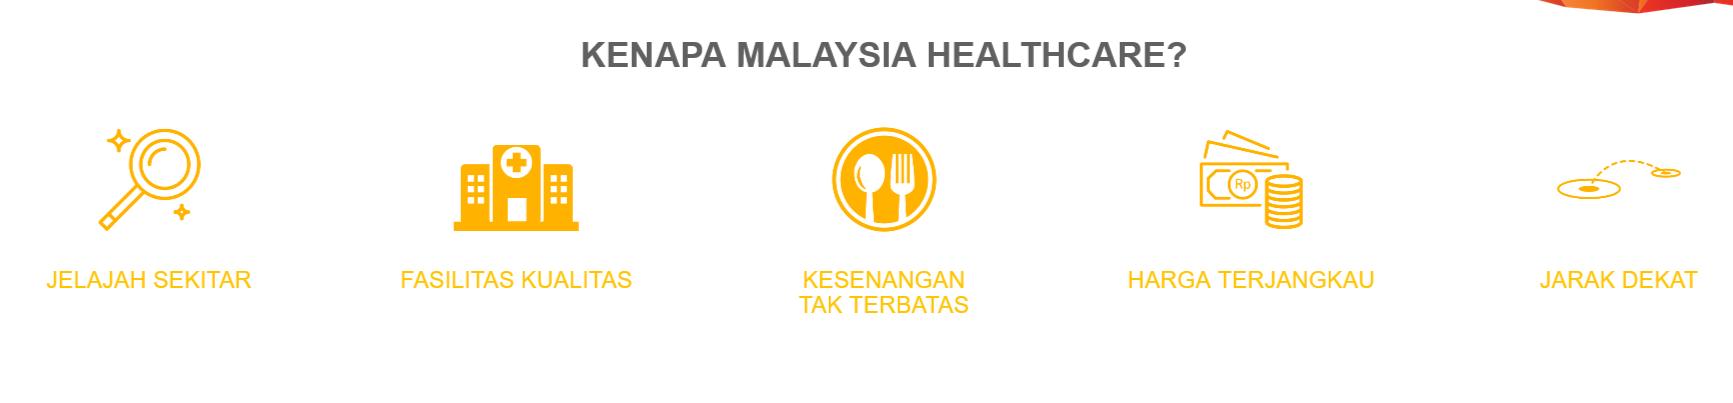 MHTC Penang malaysia